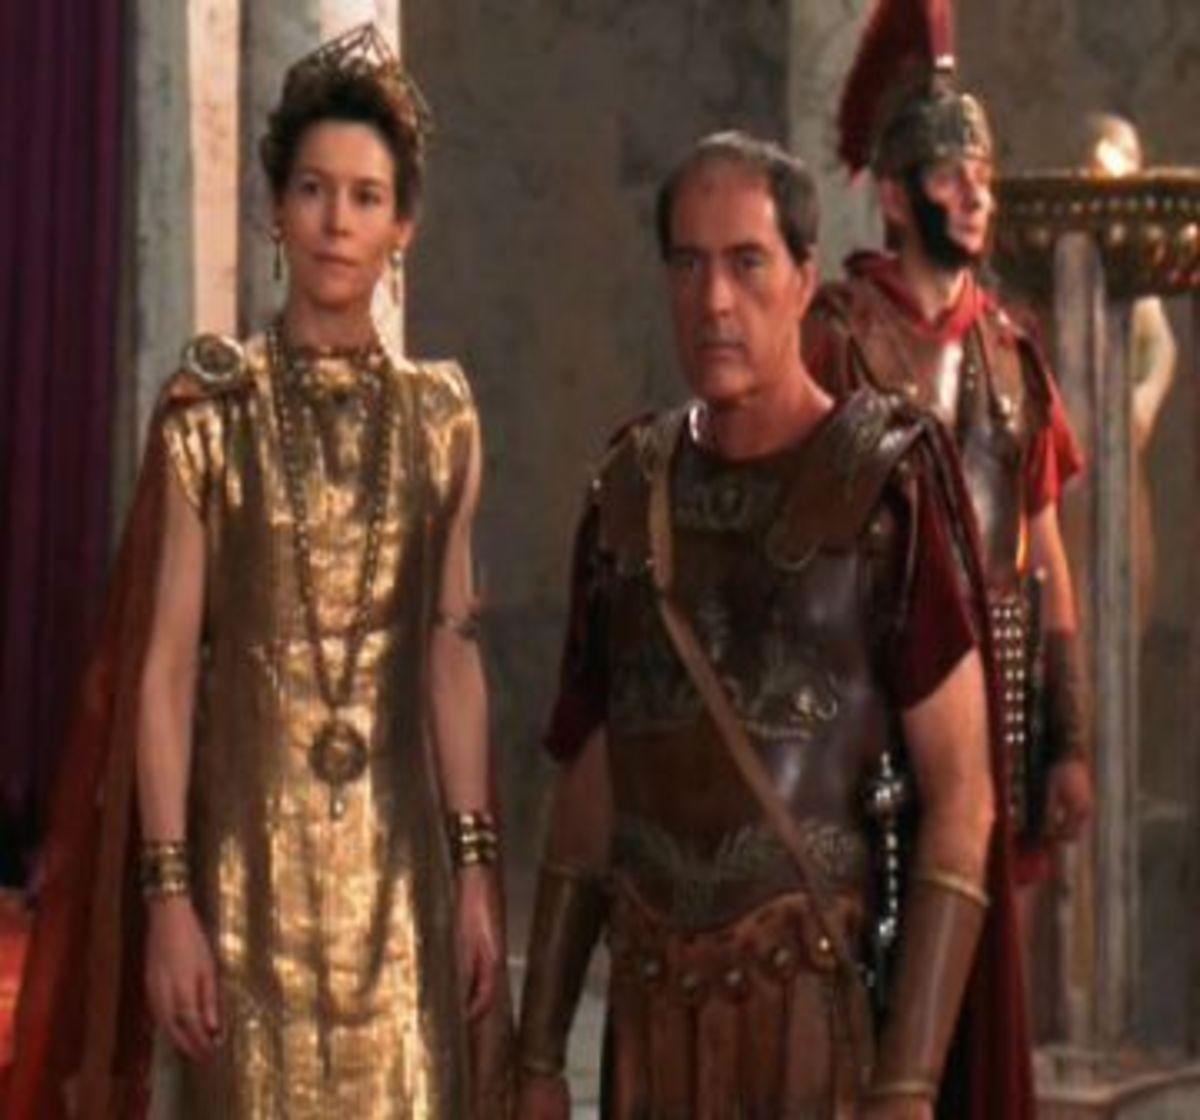 Empress Placidia (left).